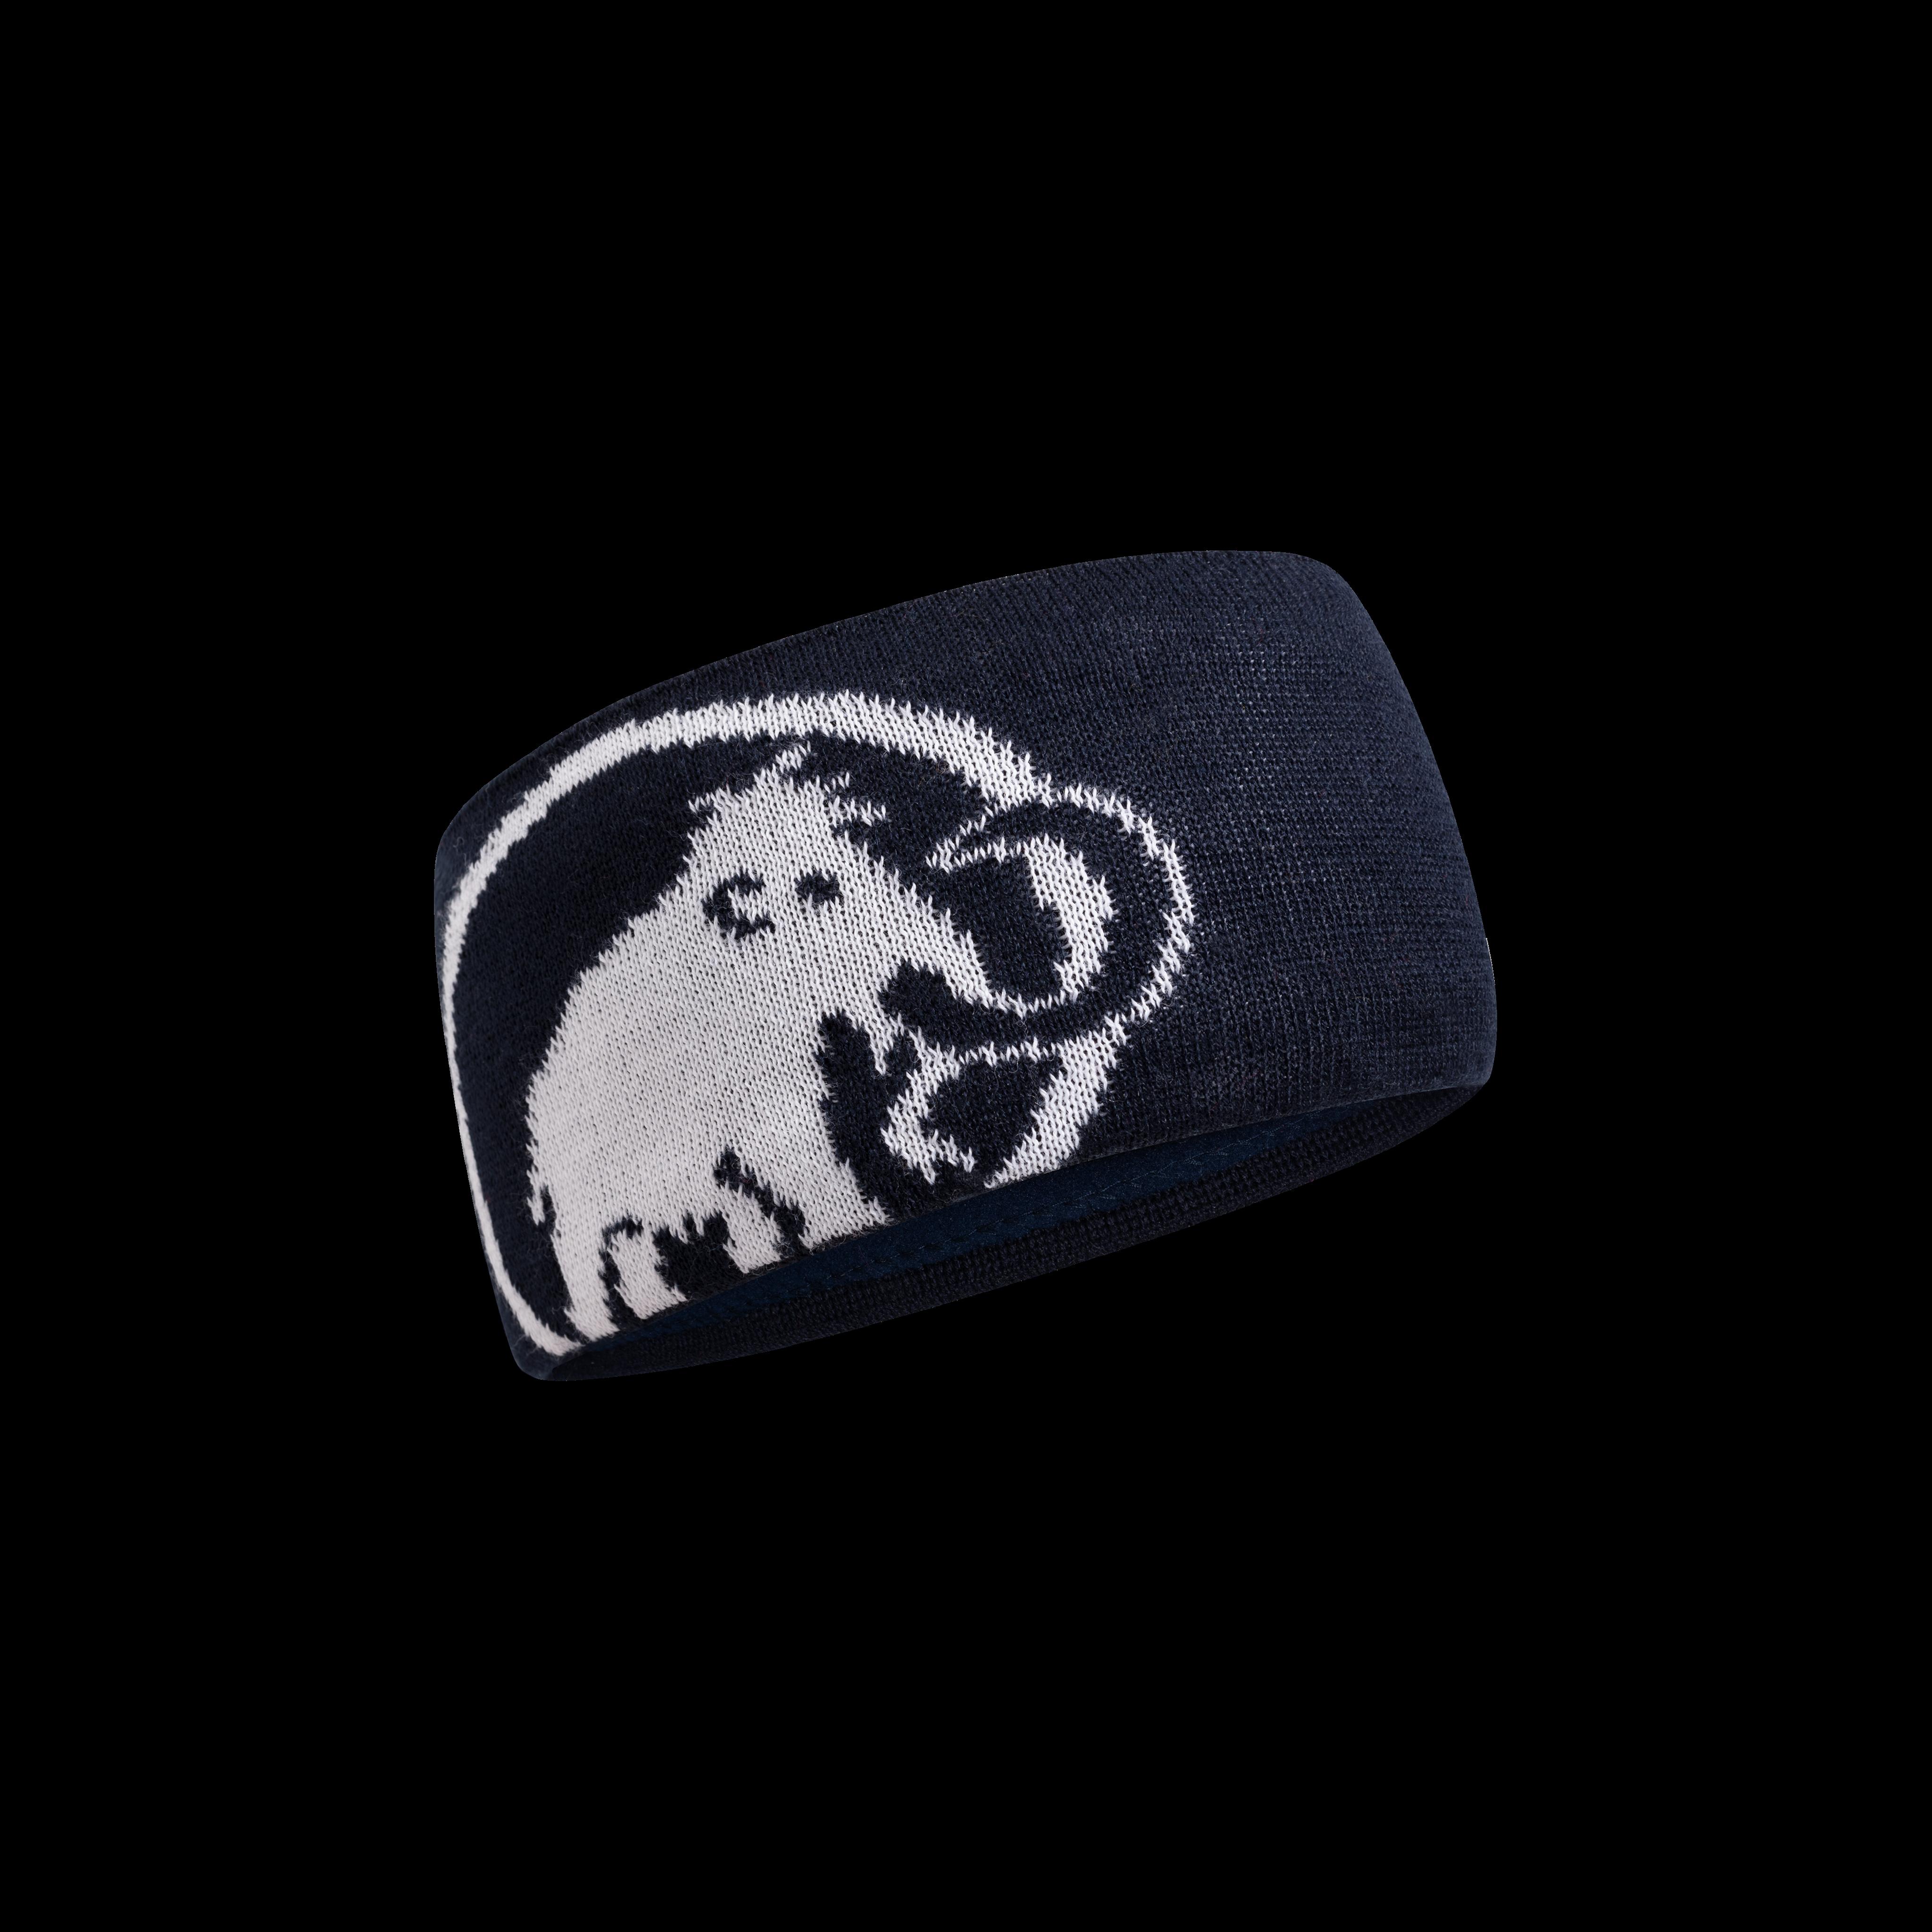 Tweak Headband - marine-white, one size thumbnail